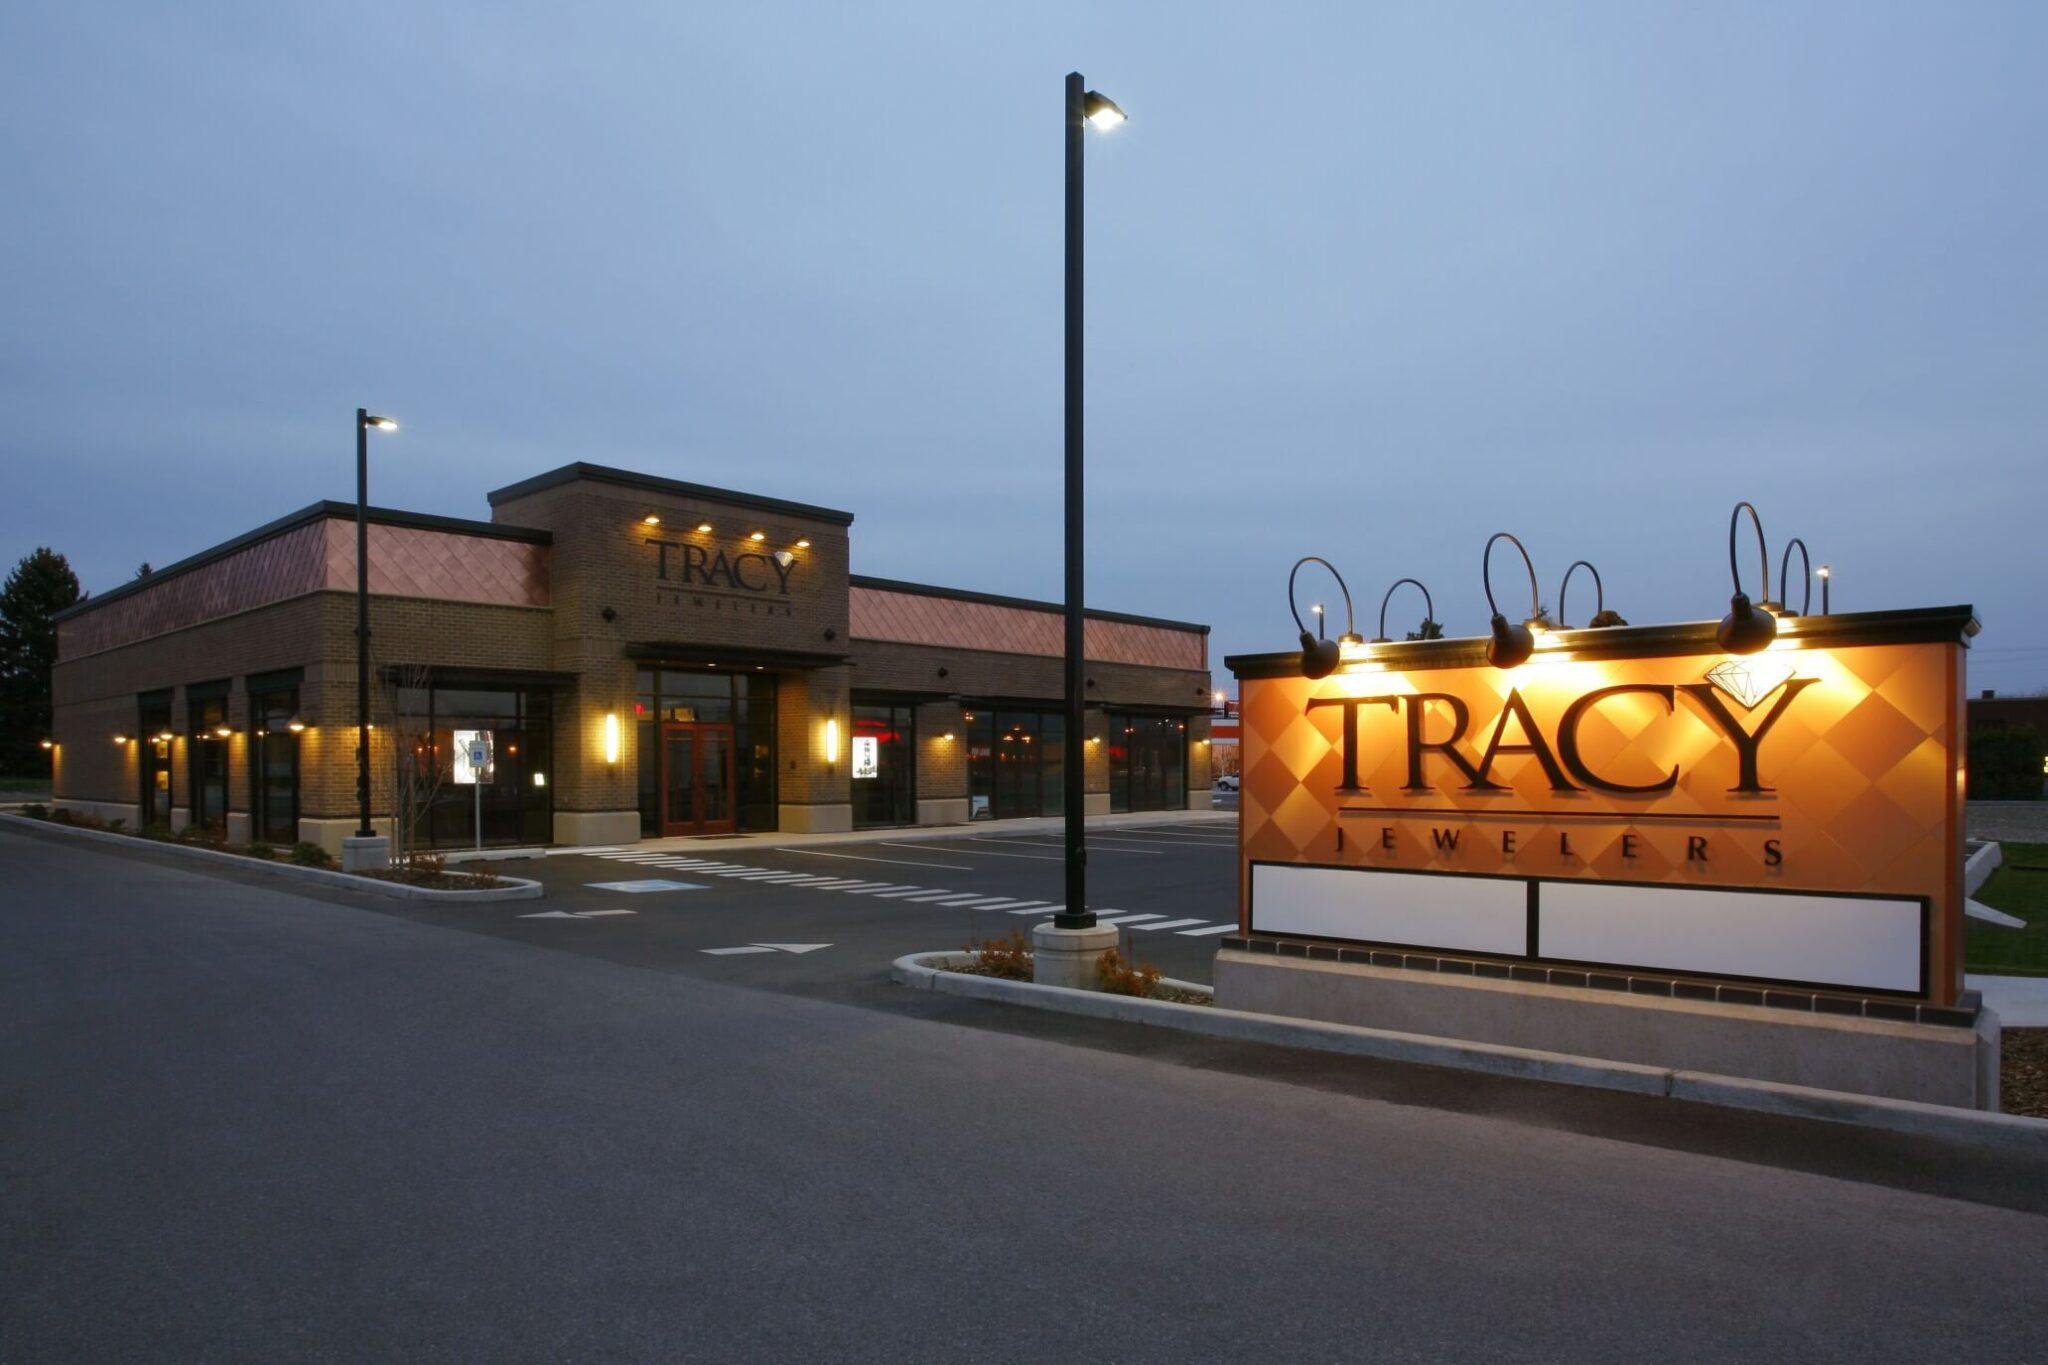 Tracy Jewelers